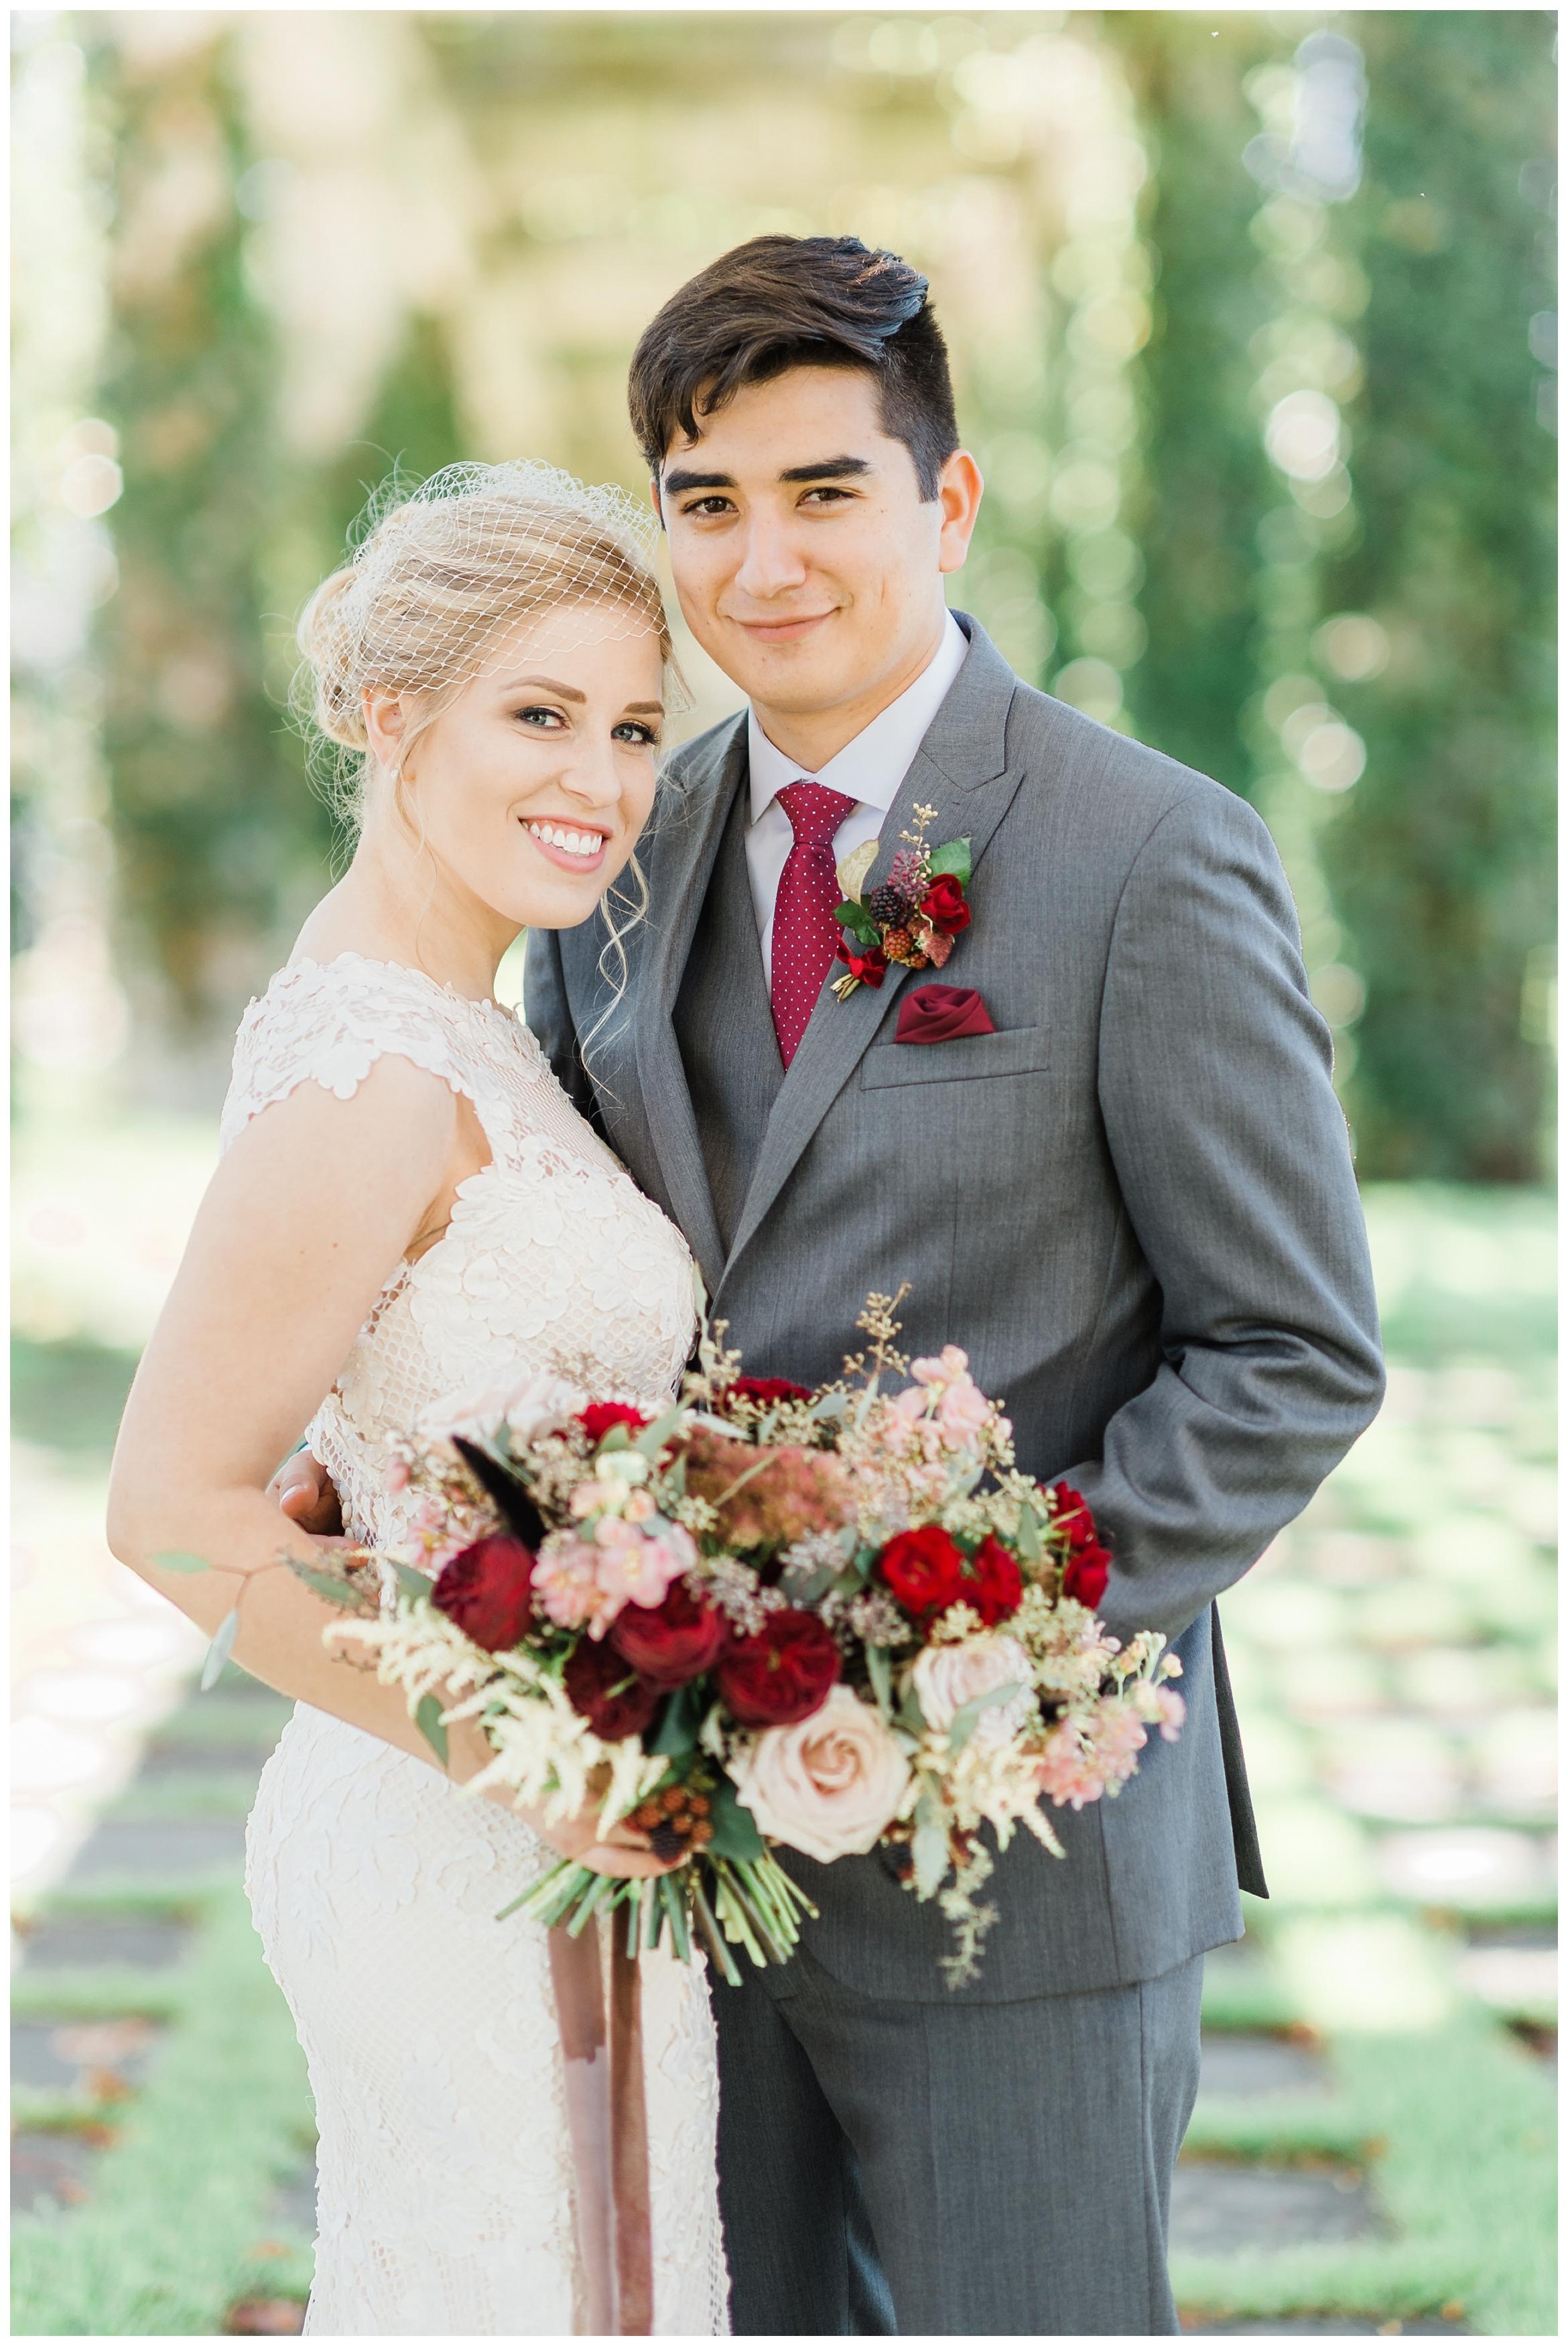 Rebecca_Shehorn_Photography_Indianapolis_Wedding_Photographer_7322.jpg